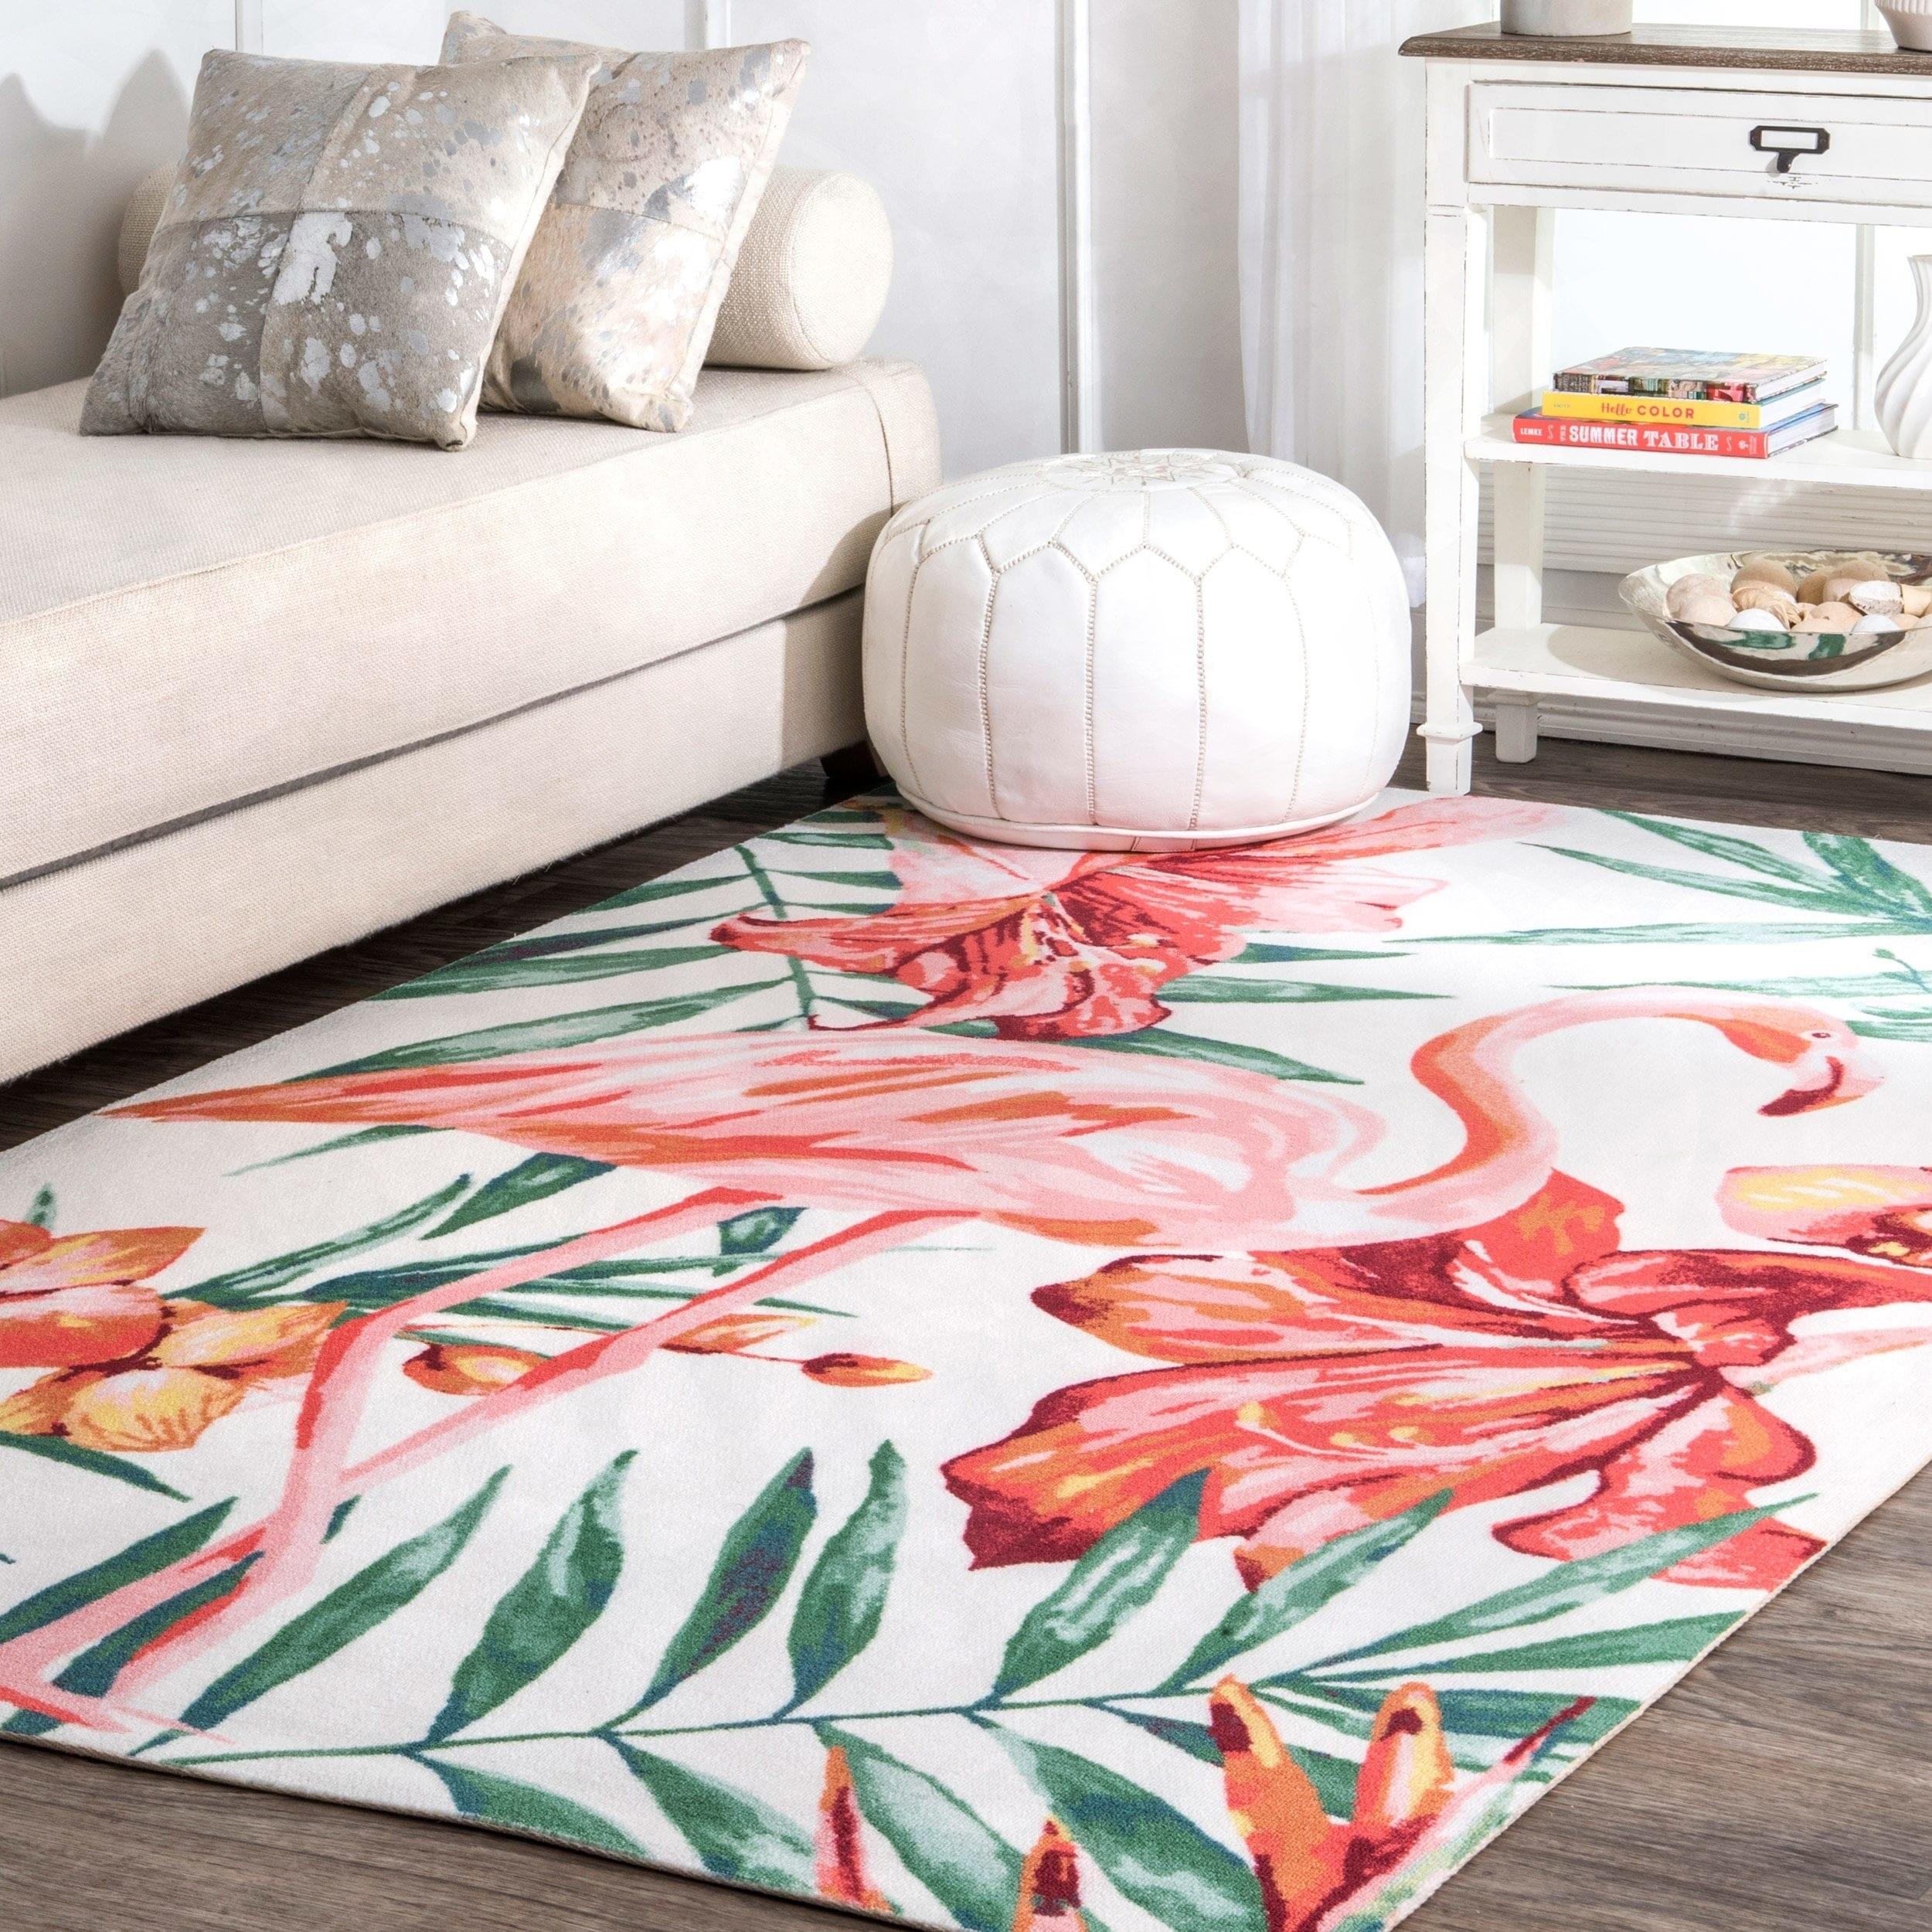 Rugs Carpets Tropical Leaves Flamingo Geometric Patterns